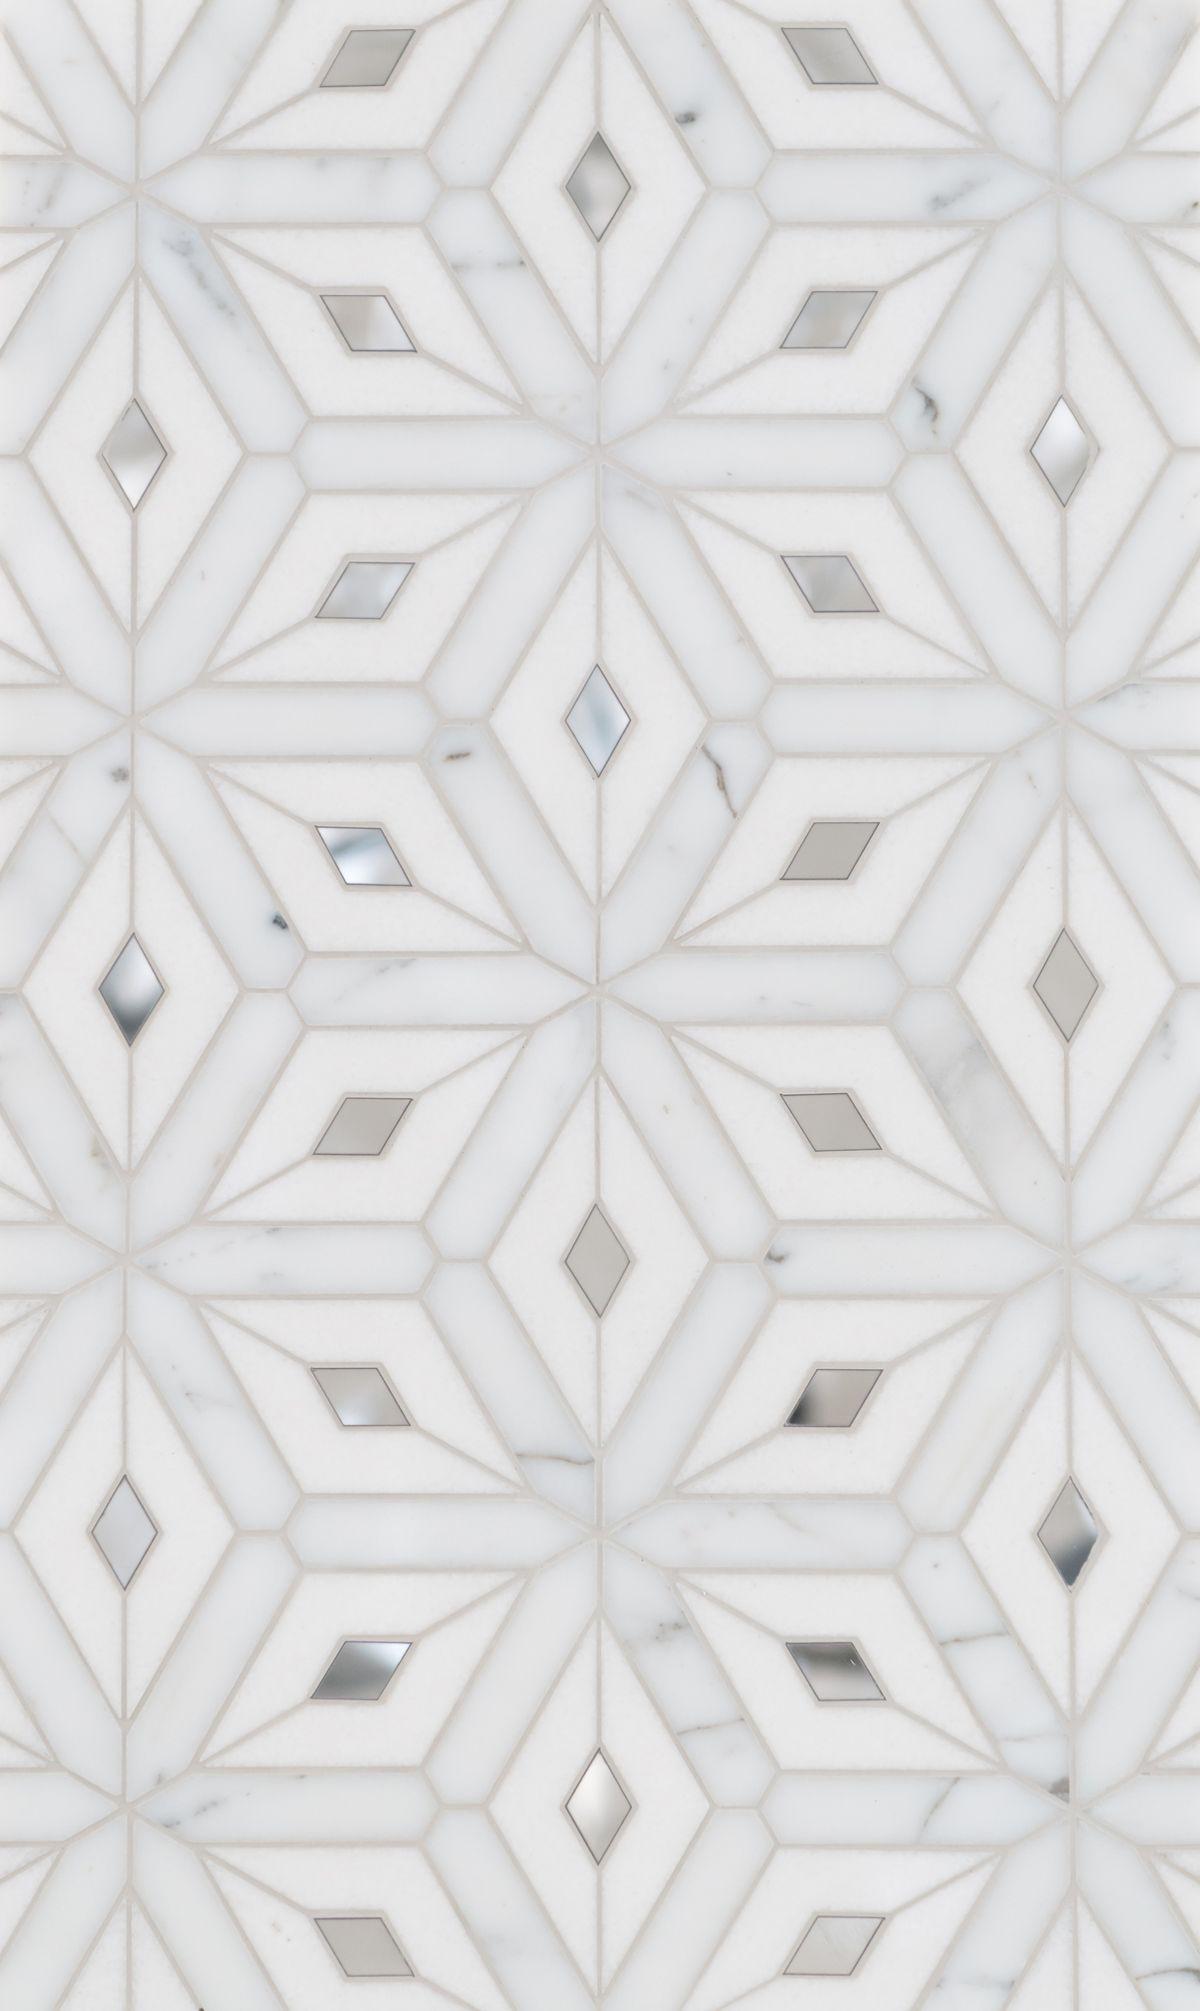 Pin By Jules Jenn On Textures Jules Jenn Tile Patterns Mosaic Mosaic Tiles